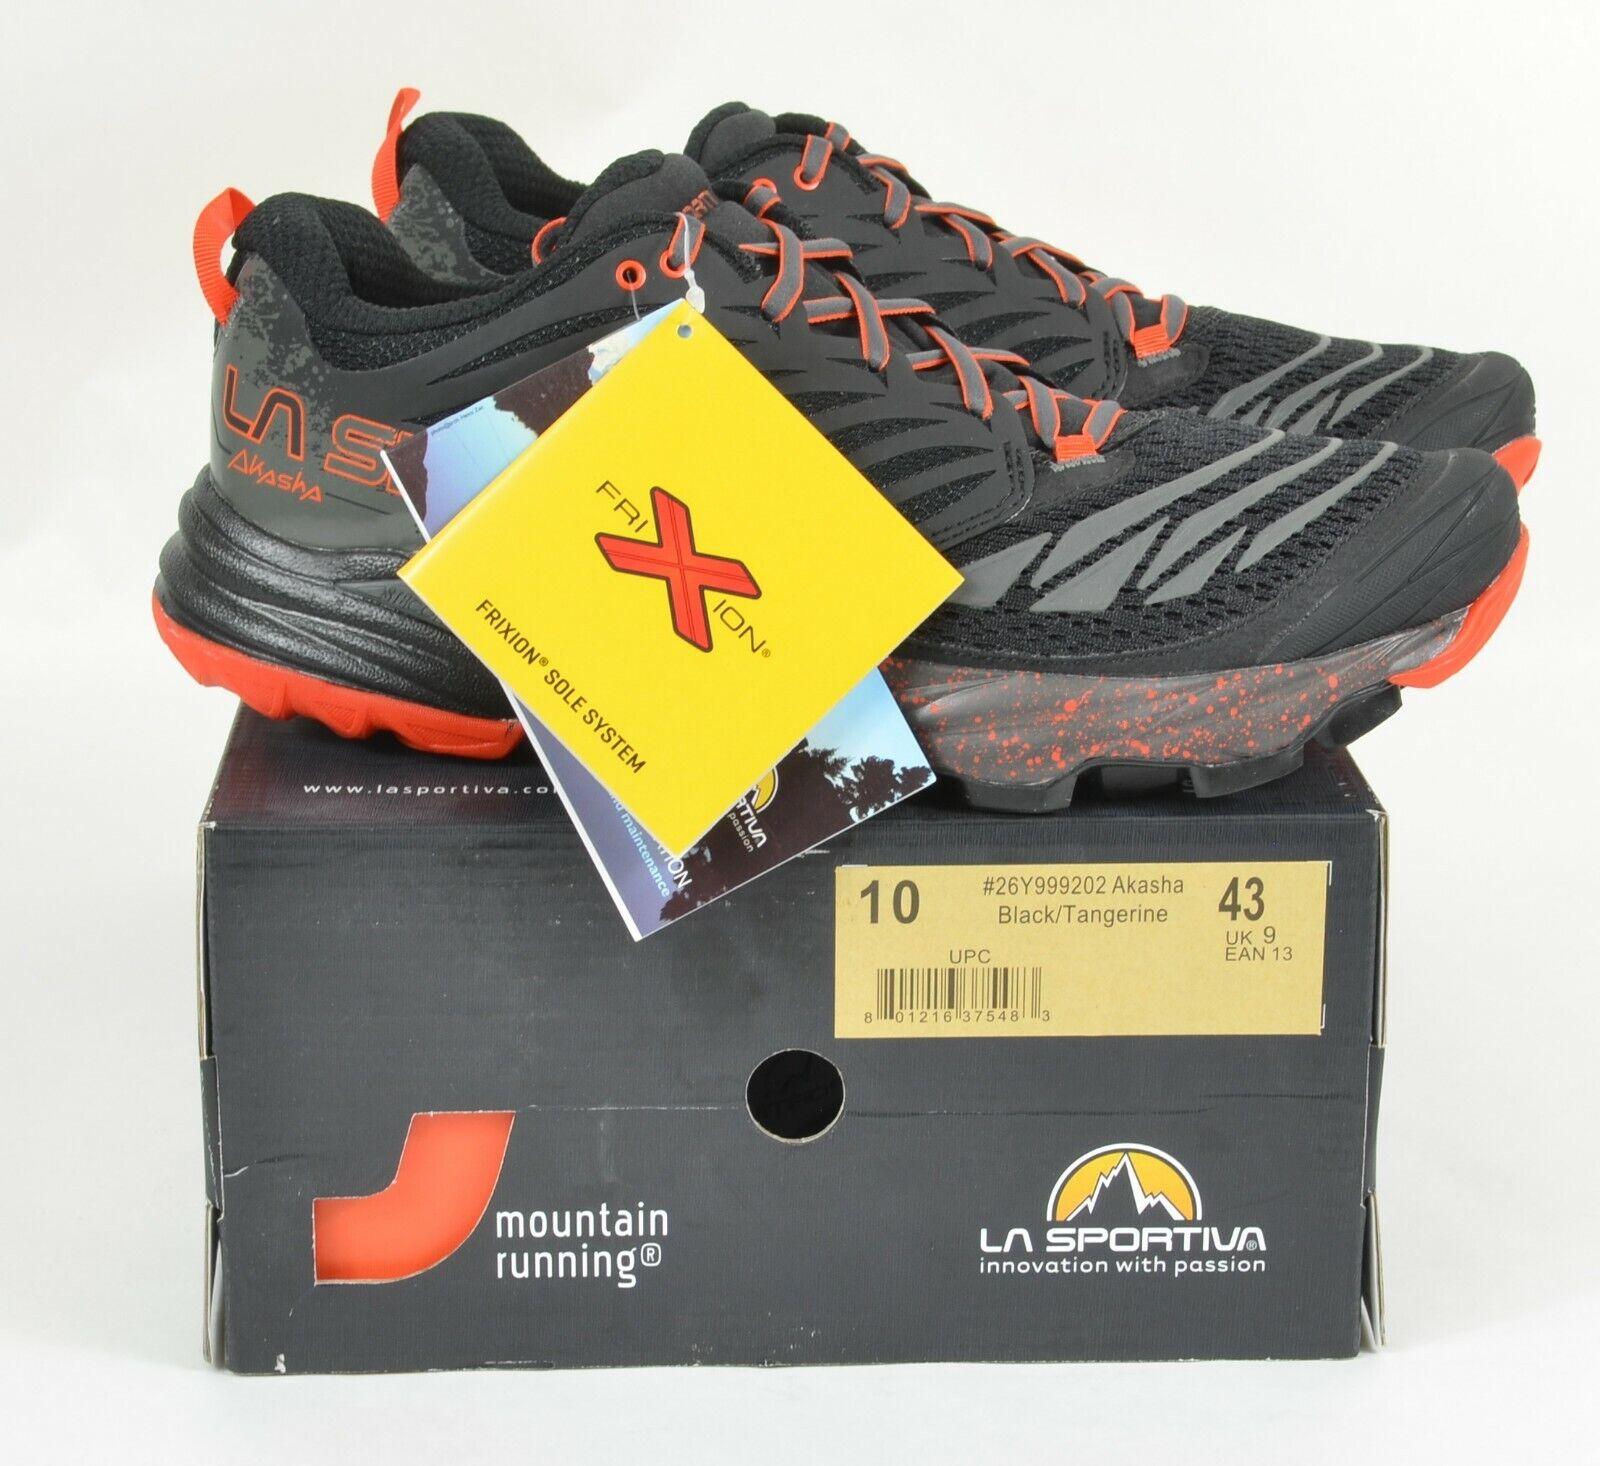 La Akasha Black 10 Shoes Trail Running Men's Tangerine Sportiva gyb6vYf7